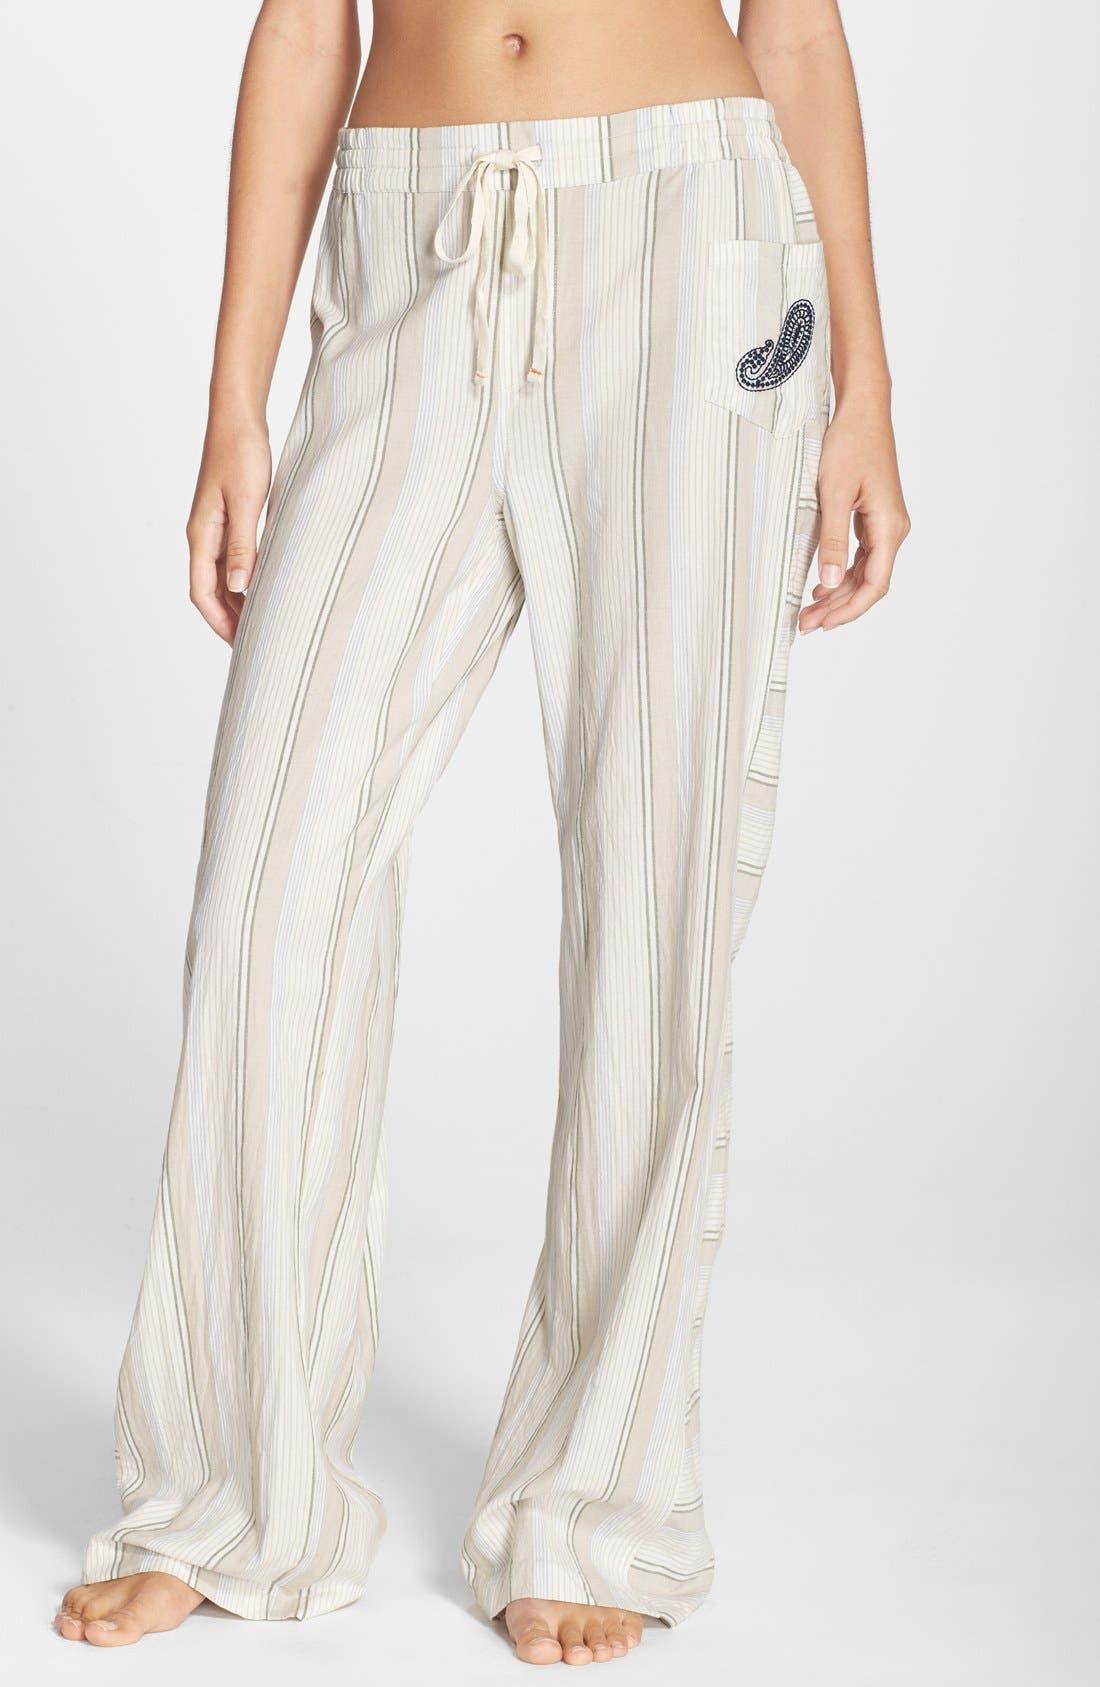 'Boho' Print Lounge Pants, Main, color, 101